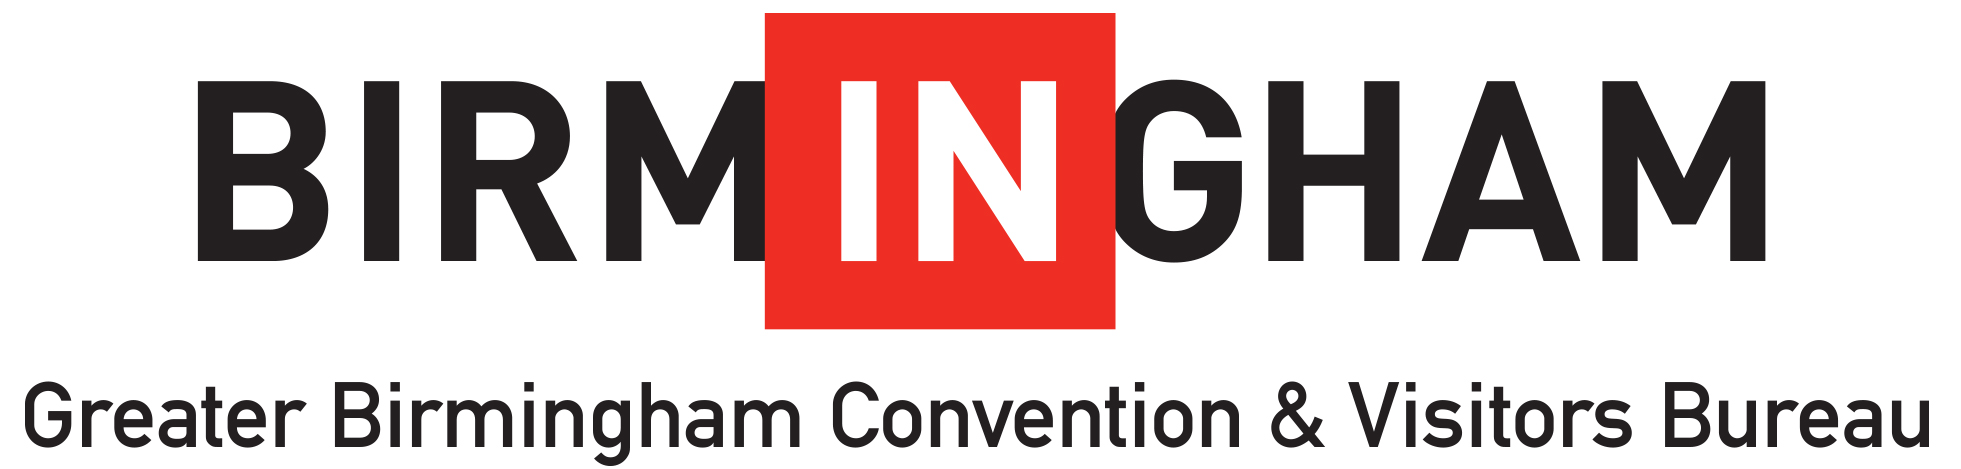 Greater Birmingham Convention & Visitors Bureau